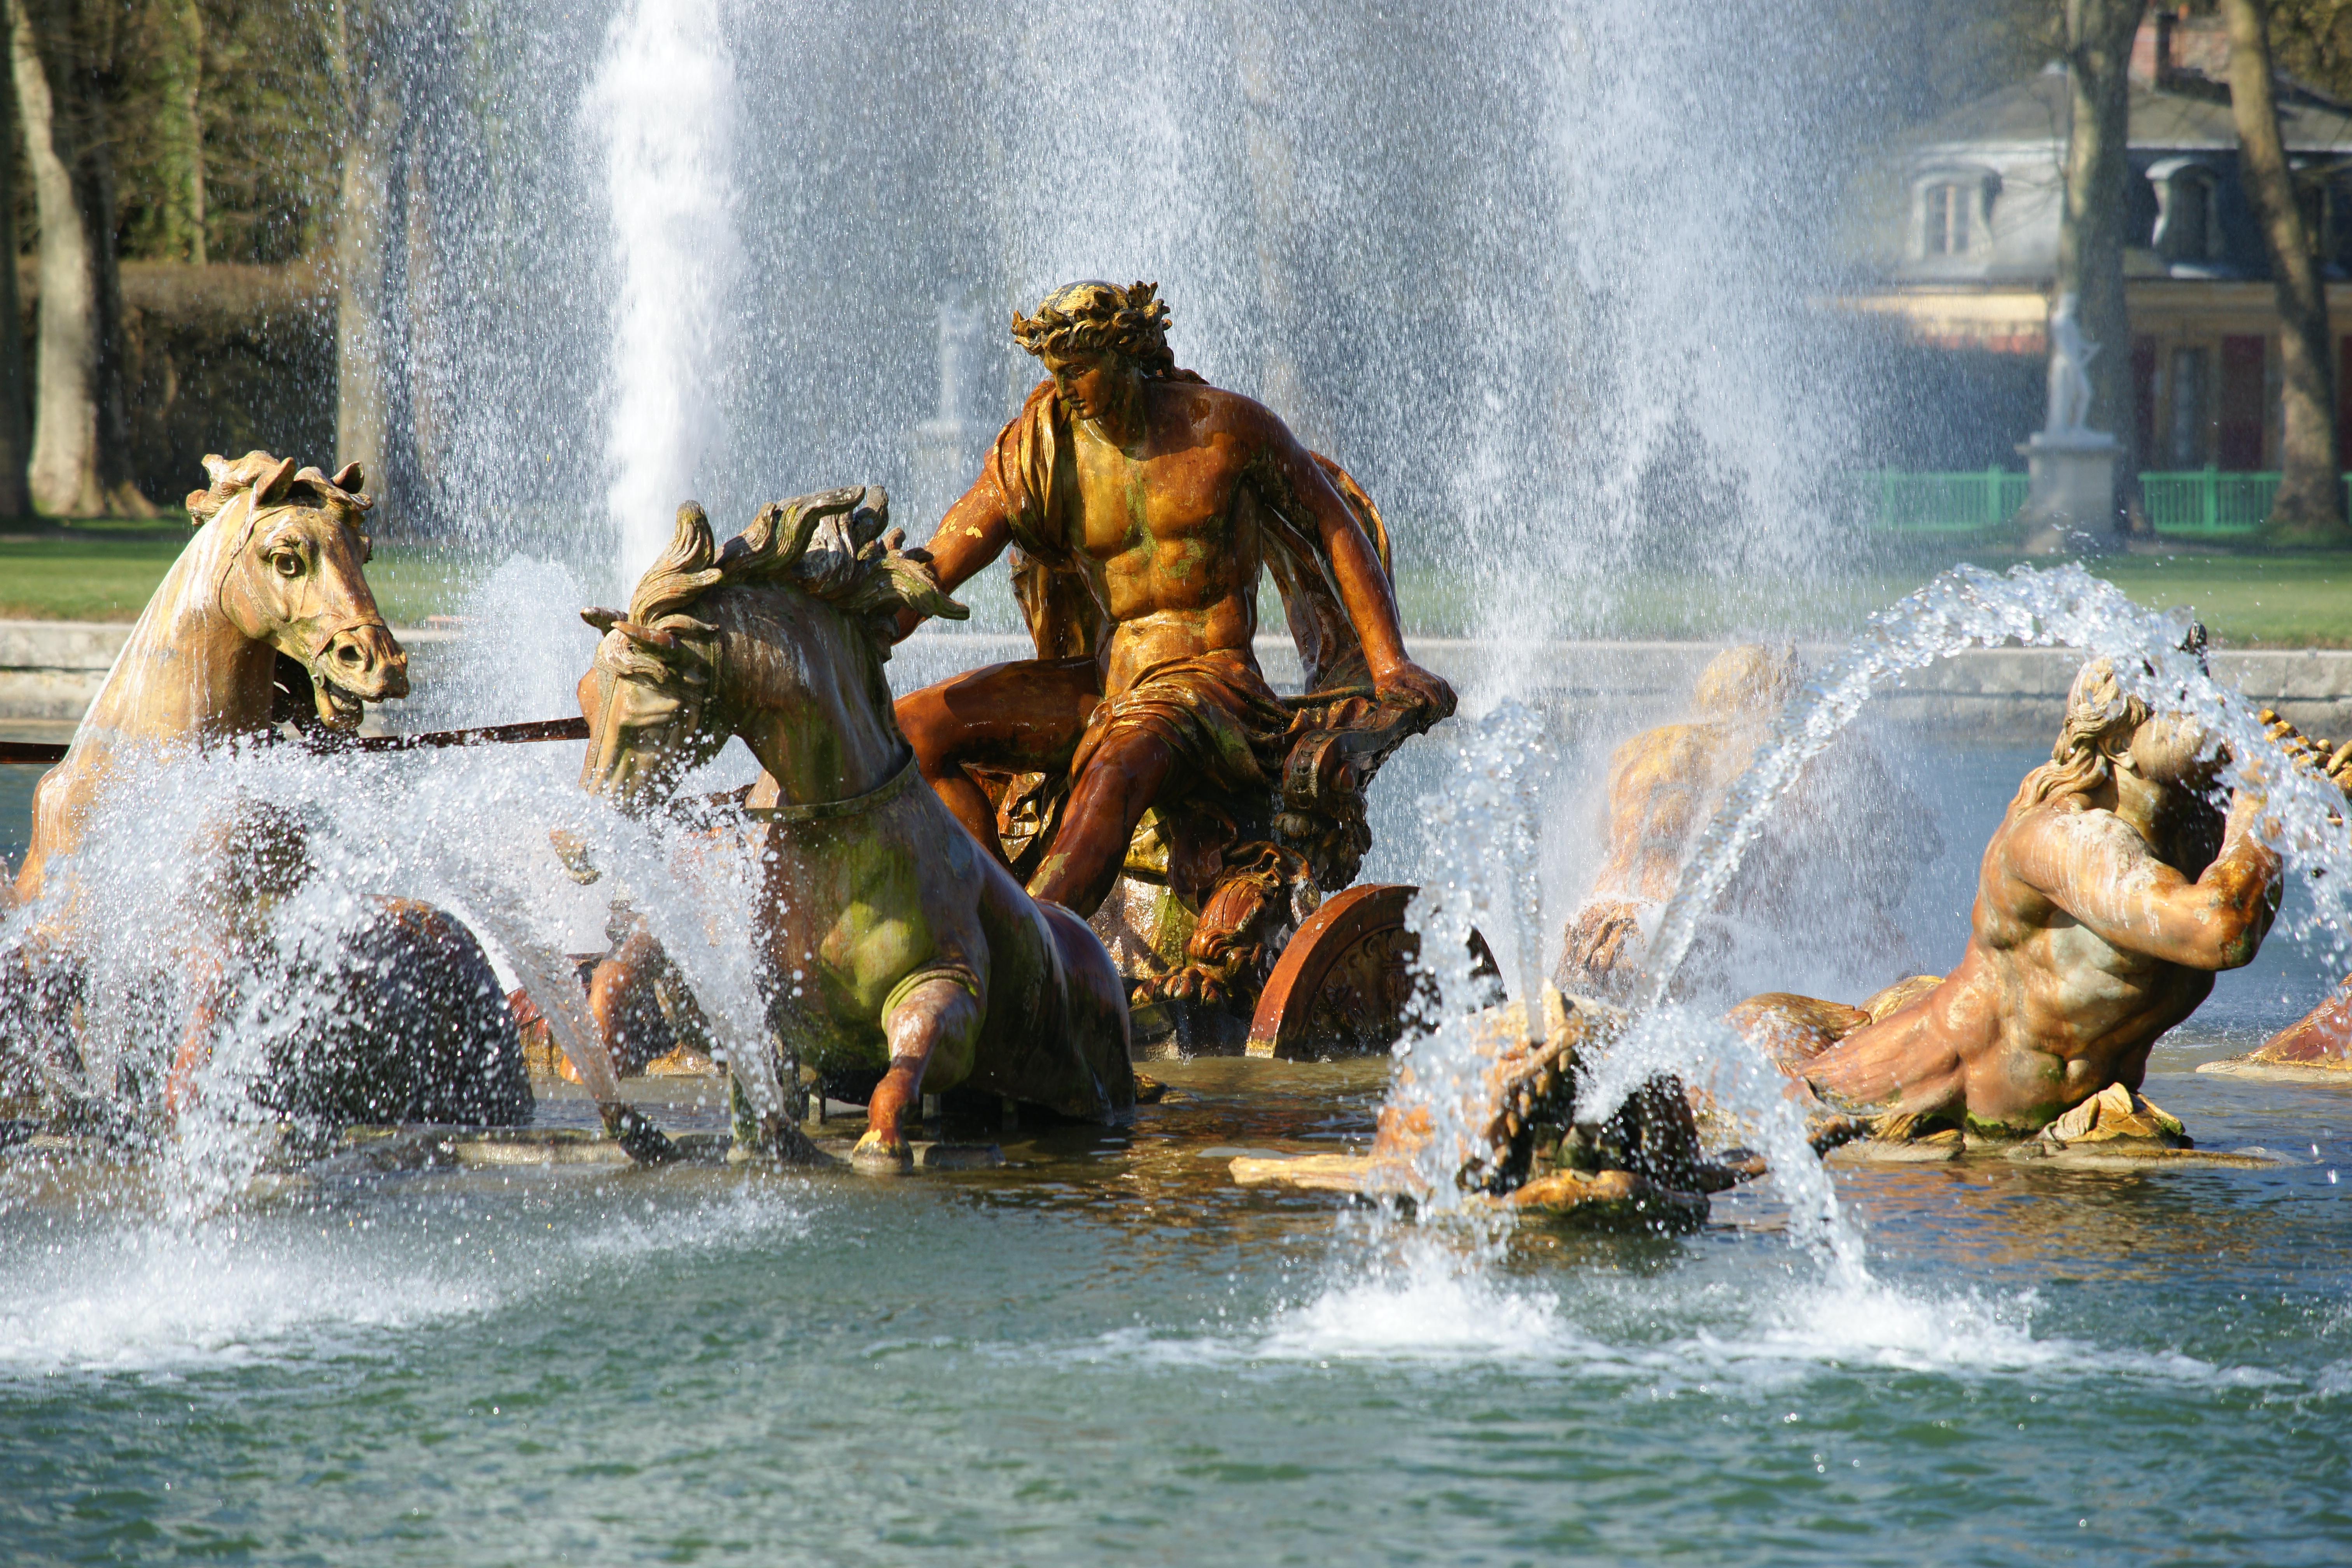 File:Versailles bassin d'apollon.JPG - Wikimedia Commons